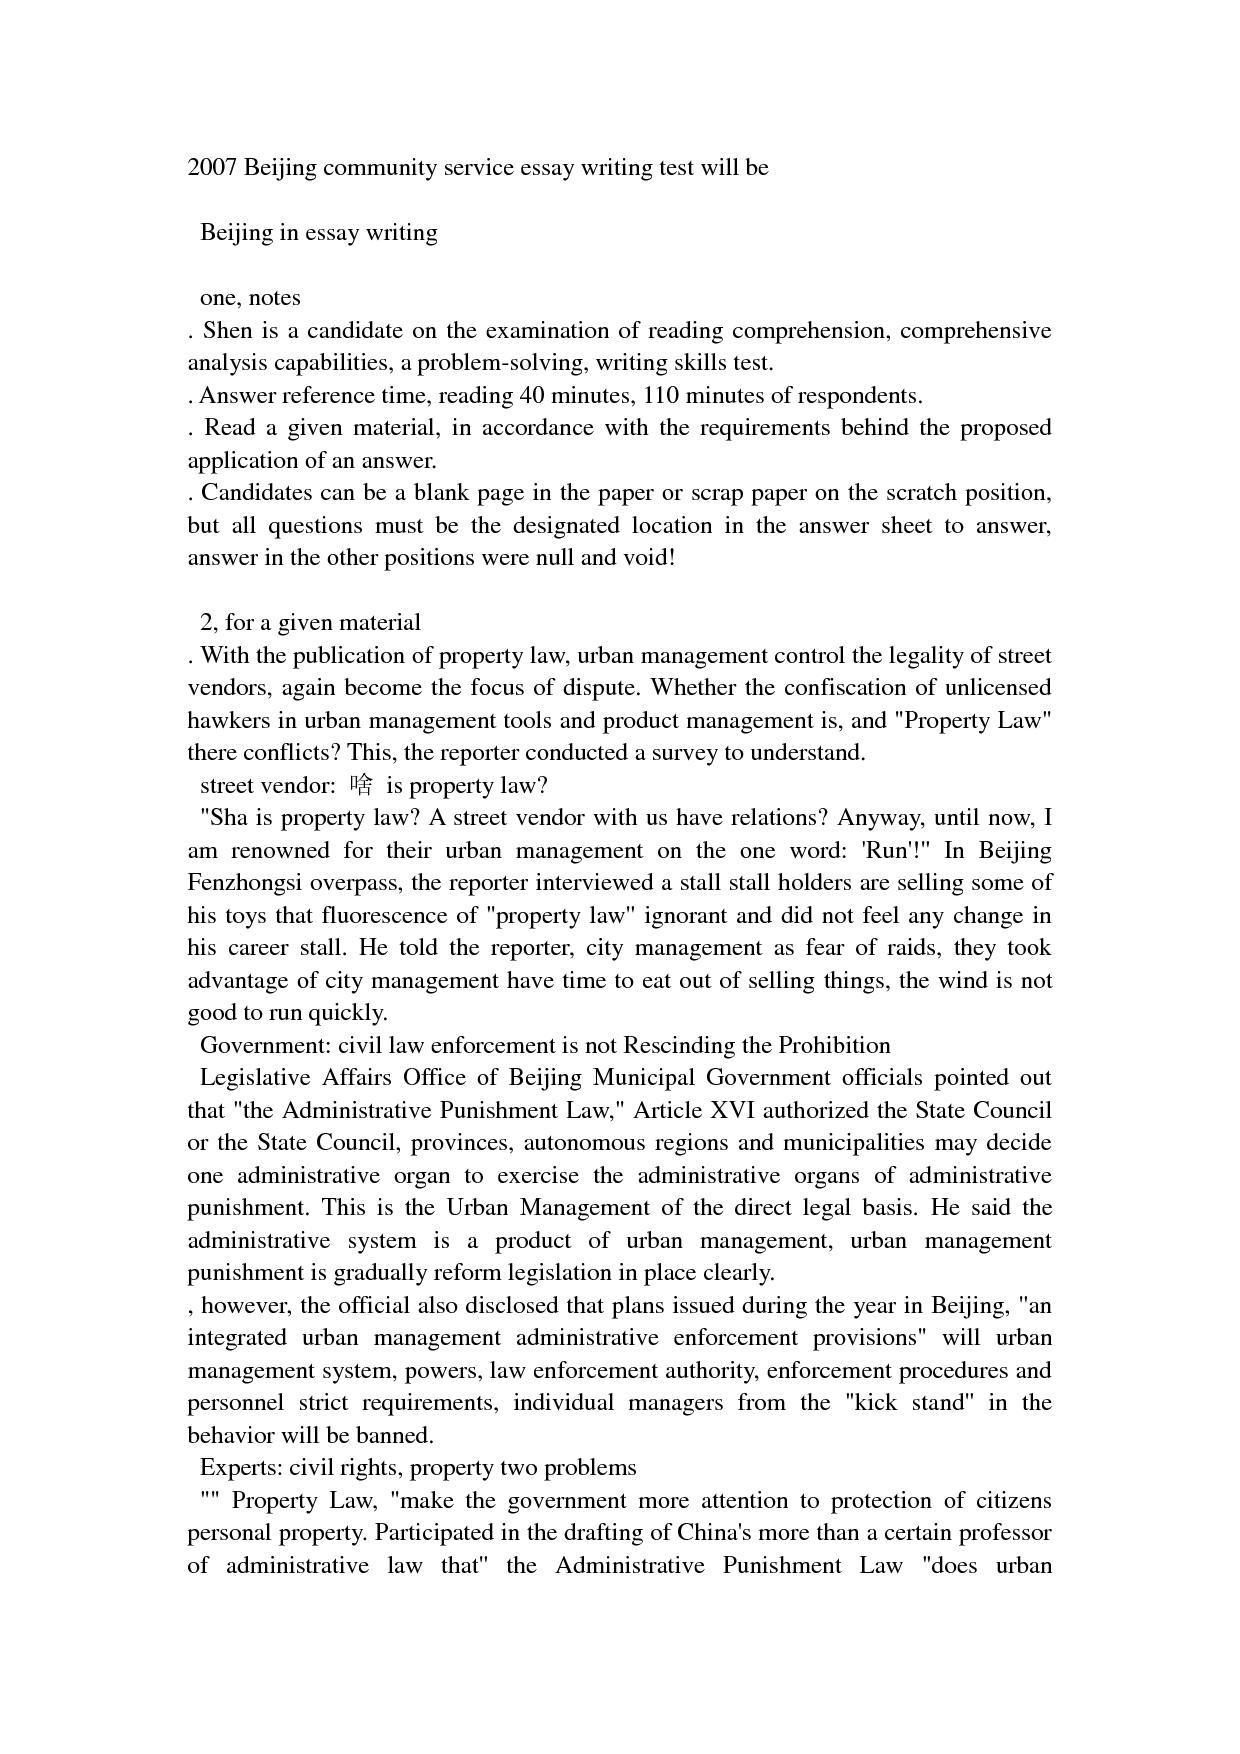 001 Saiefeojnc Essay Example On Community Best Service Involvement Argumentative Full